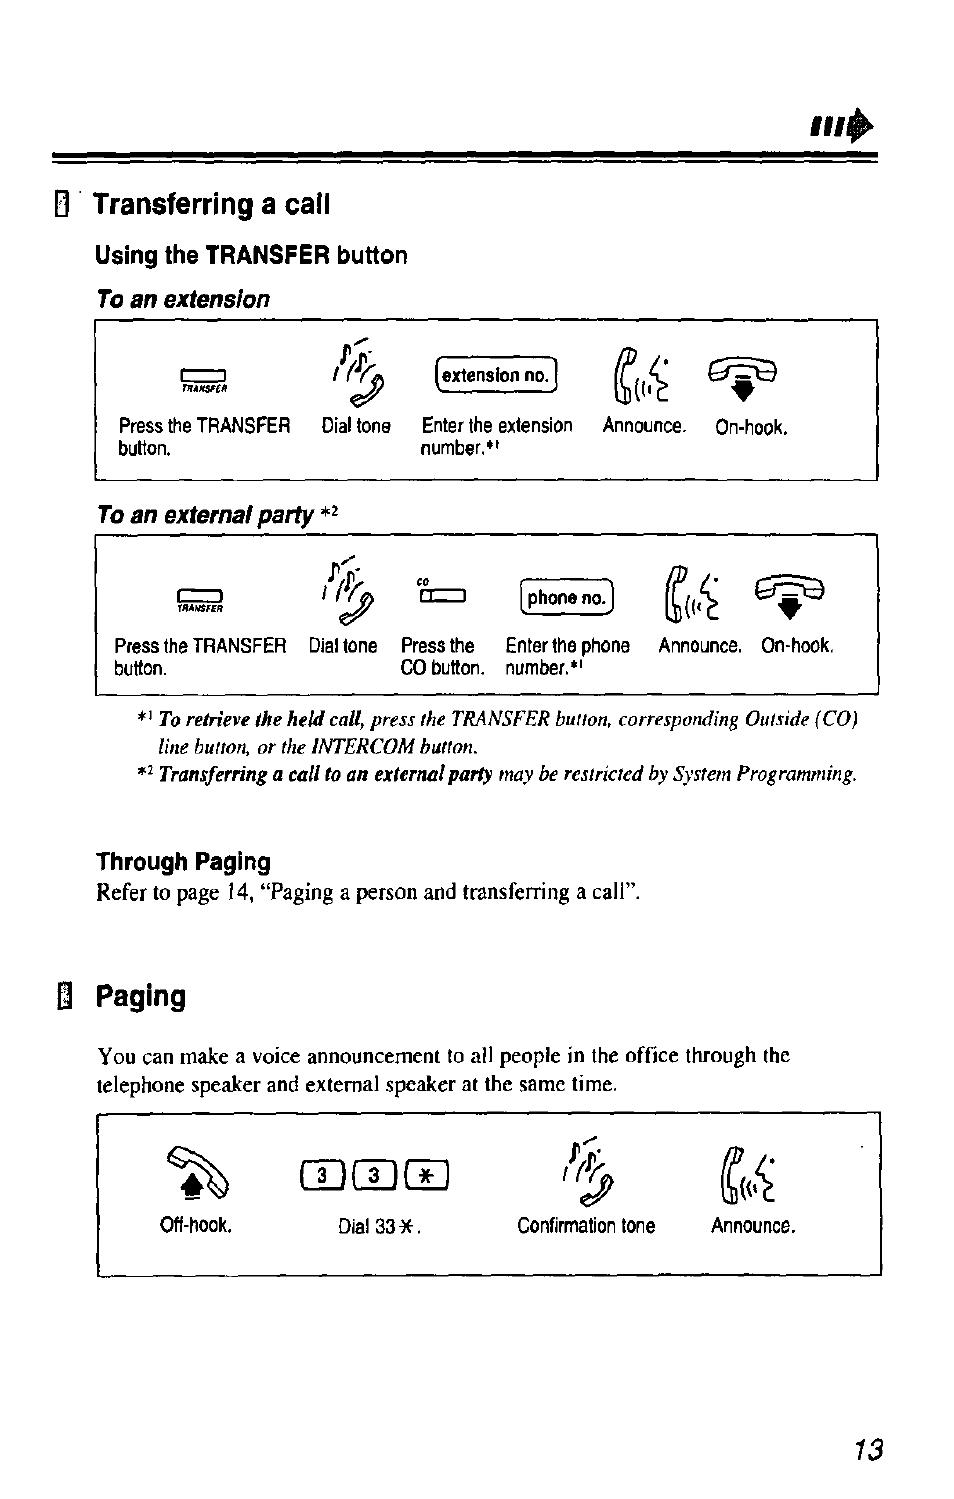 through paging i paging paging panasonic kx t7433 user manual rh manualsdir com Panasonic Kx T7433 SK Panasonic Phone KX-T7433 Manual